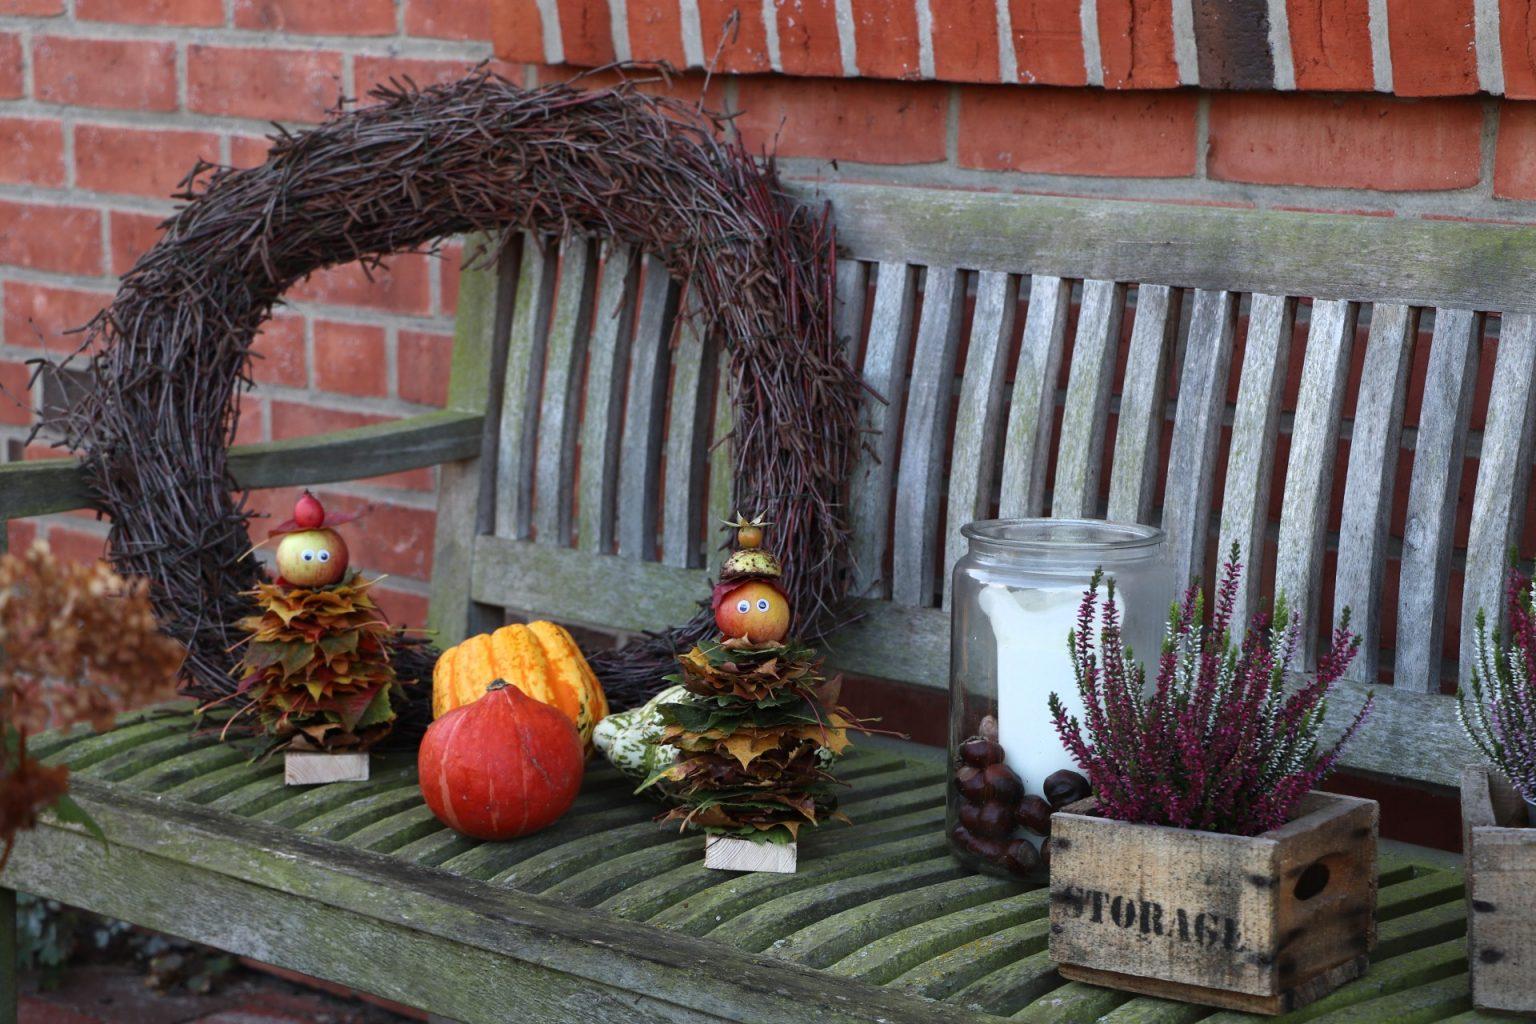 Herbst Diy Blättermännchen Basteln Mit Kindern Lavendelblog